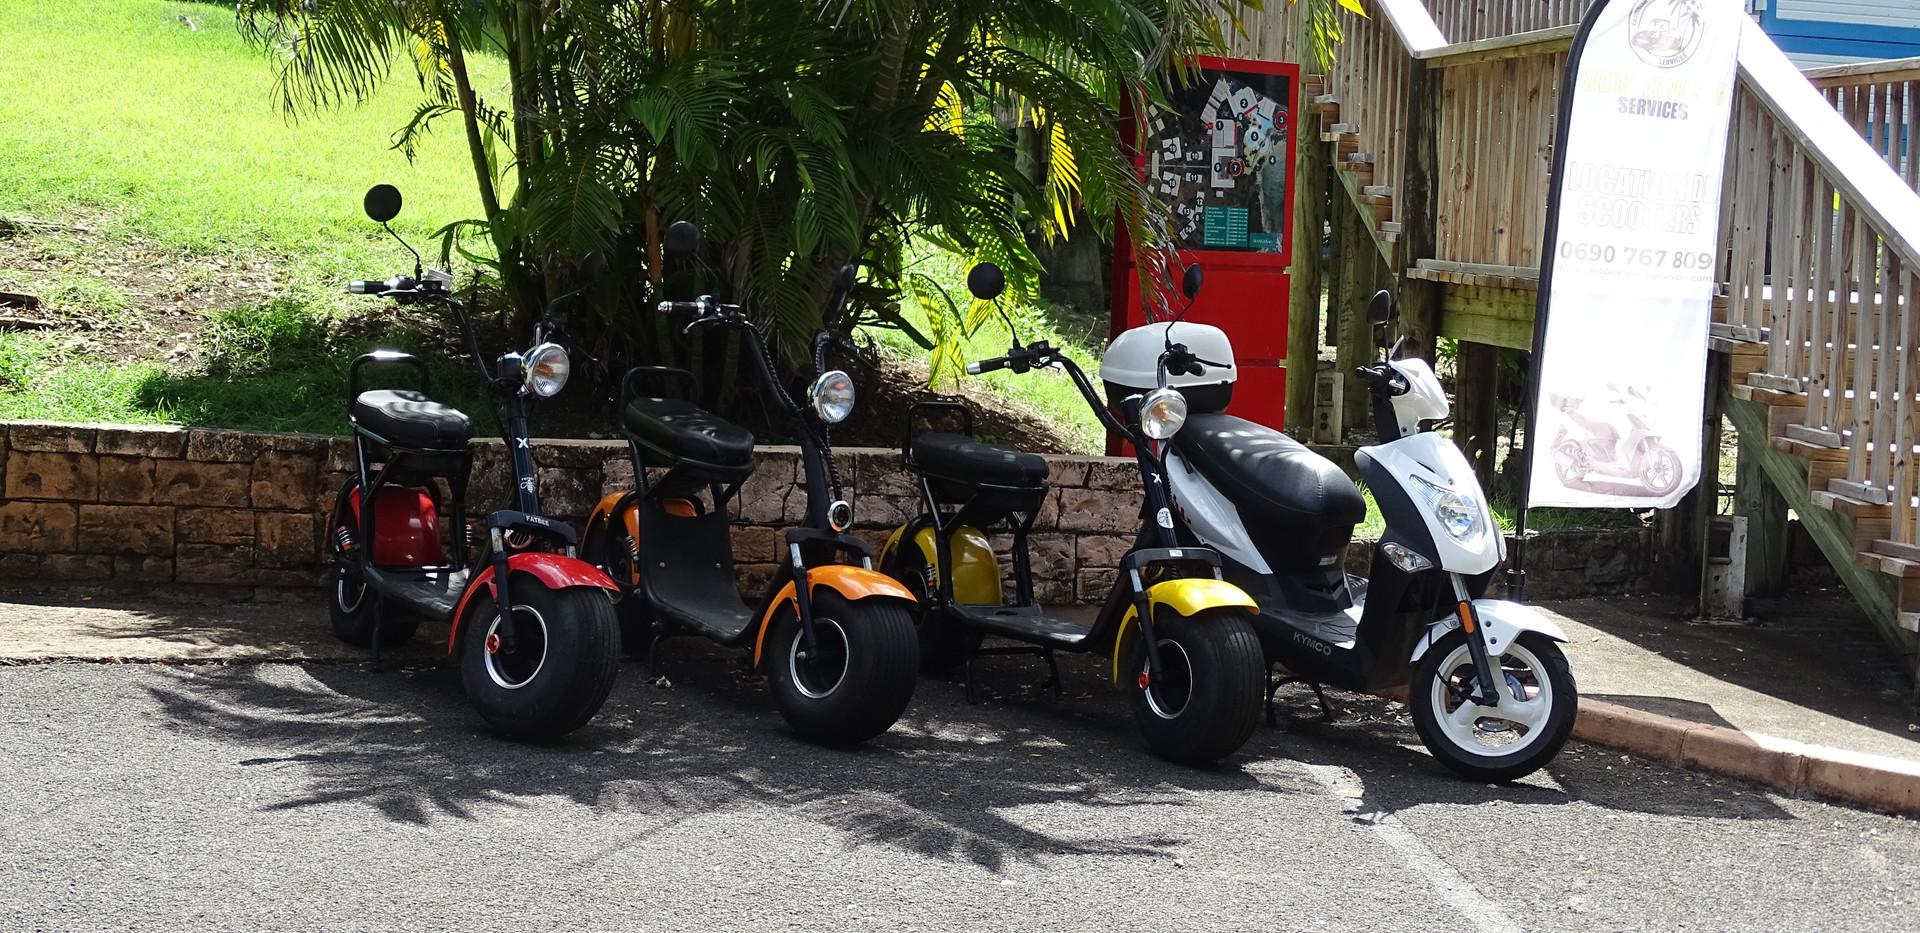 Location de scooters